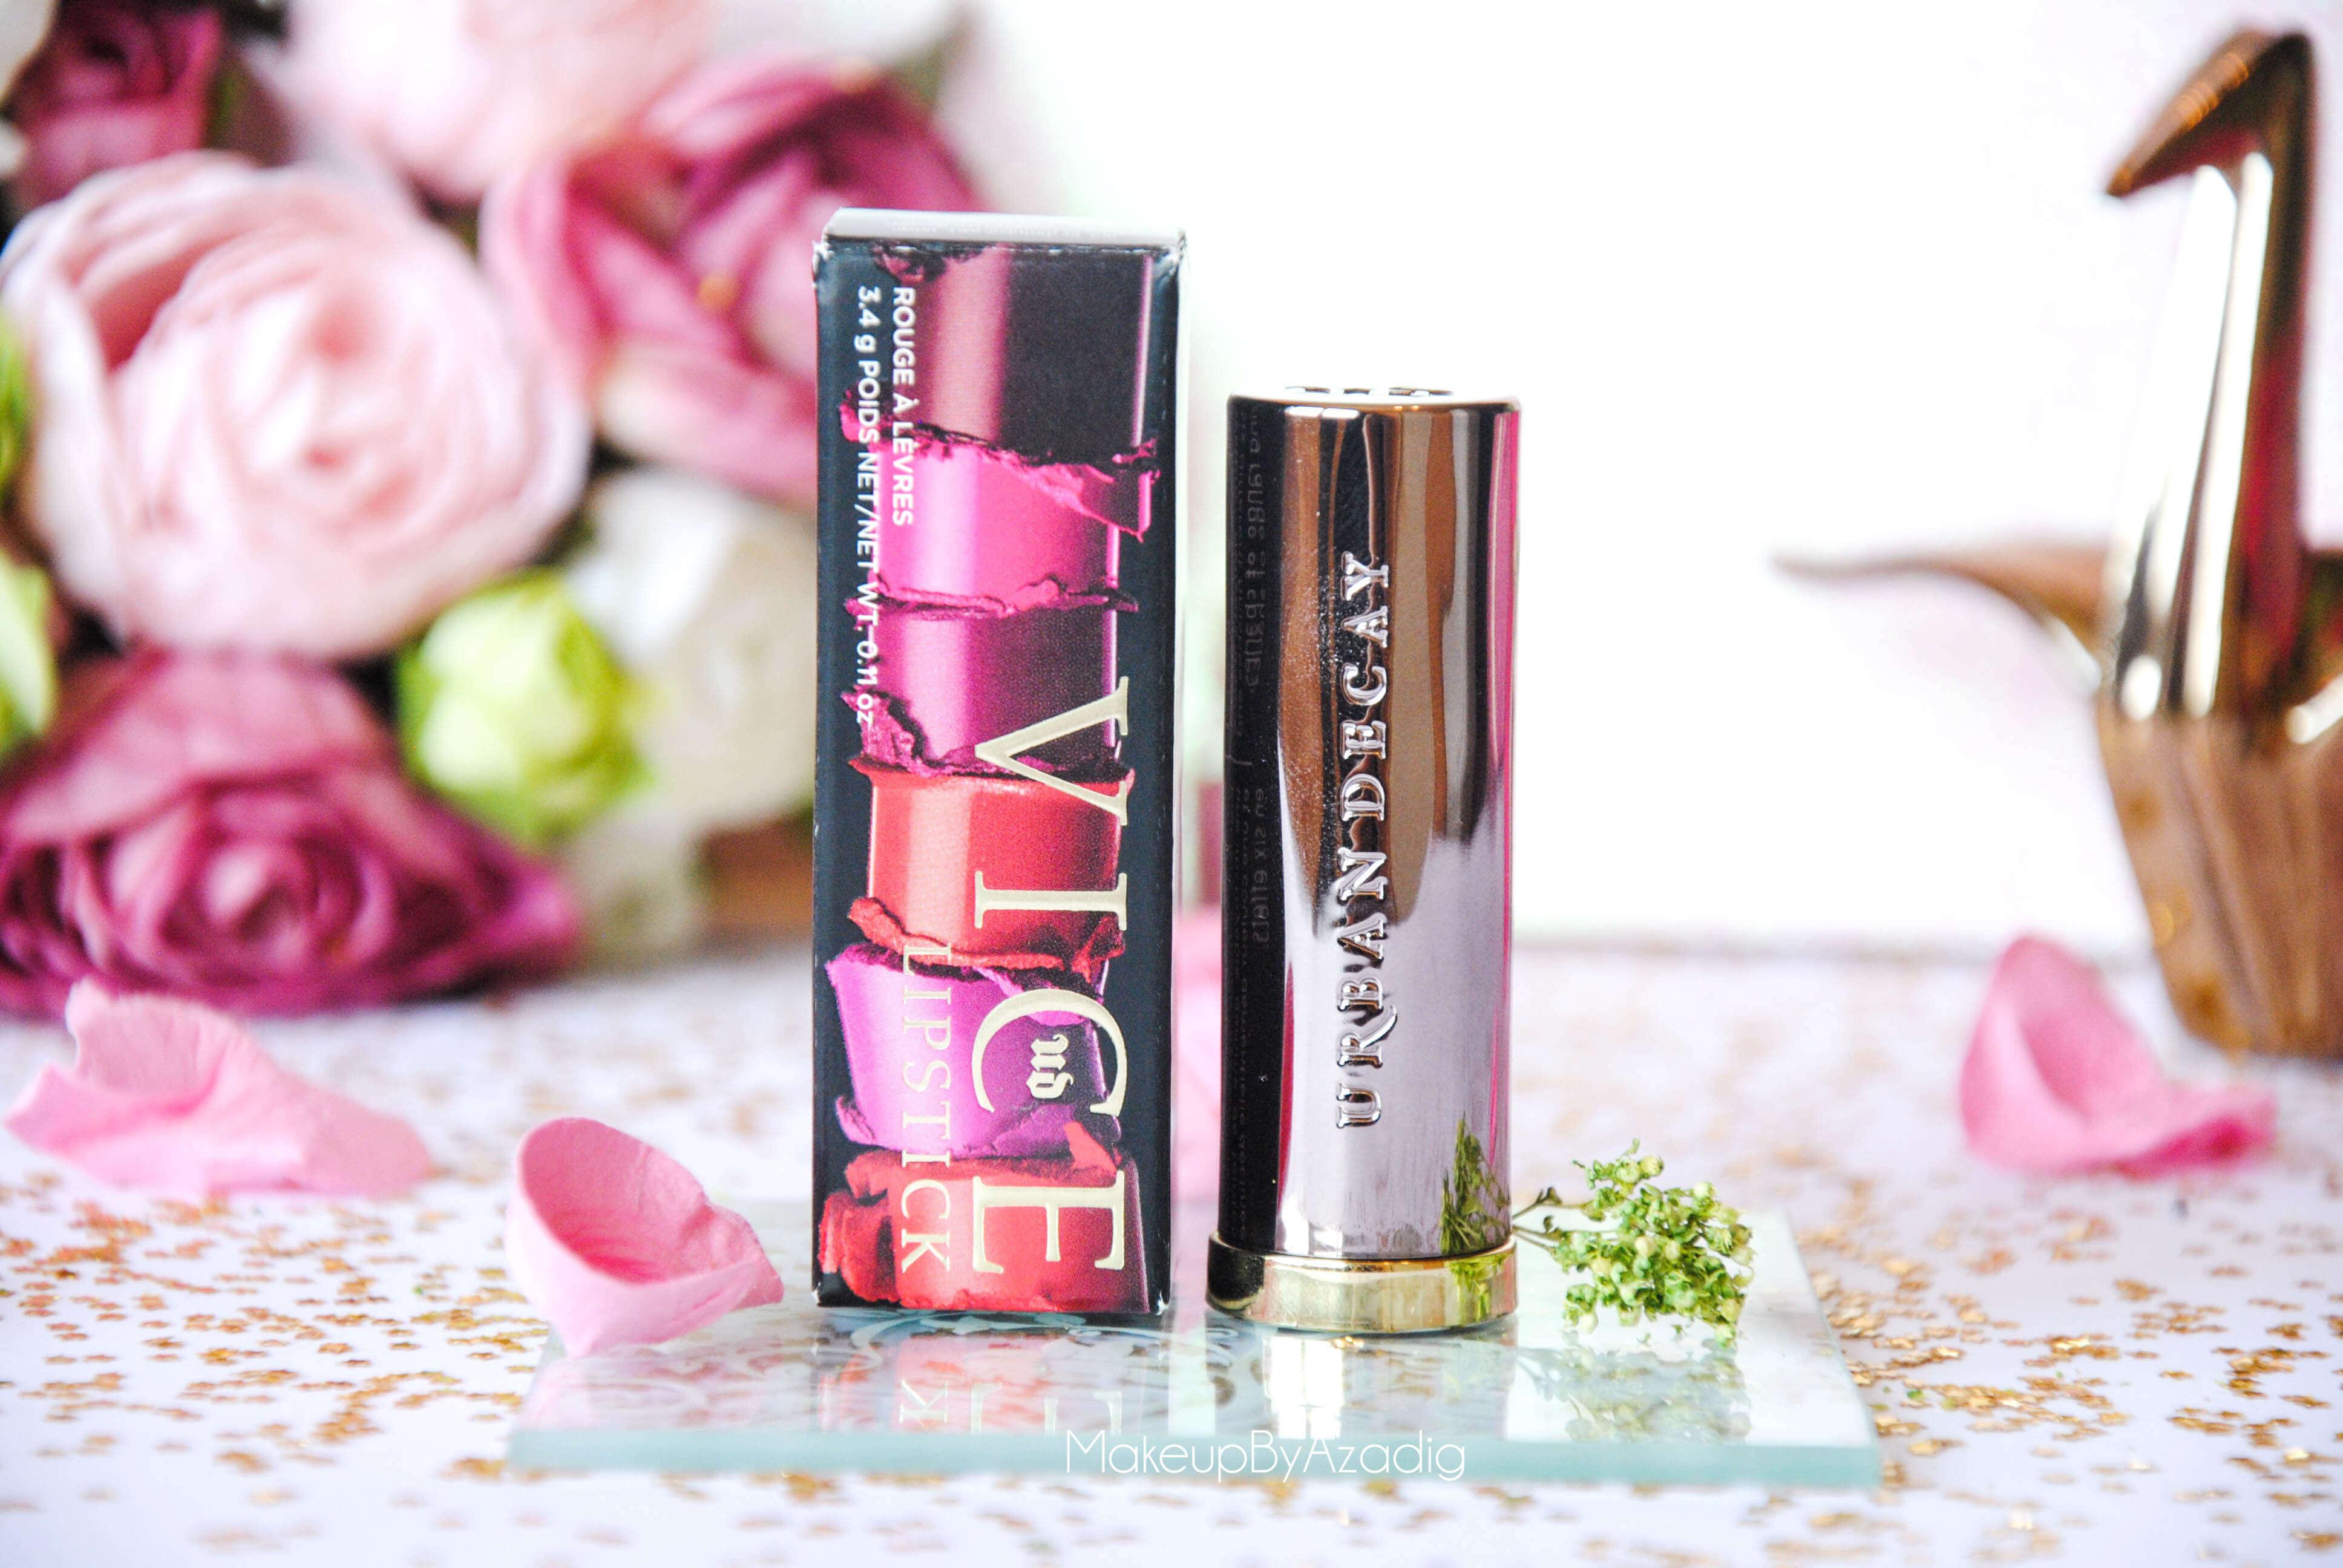 vice lipstick-urban decay-makeupbyazadig-backtalk-mauve-rouge a levres-avis-revue-swatch-review-love